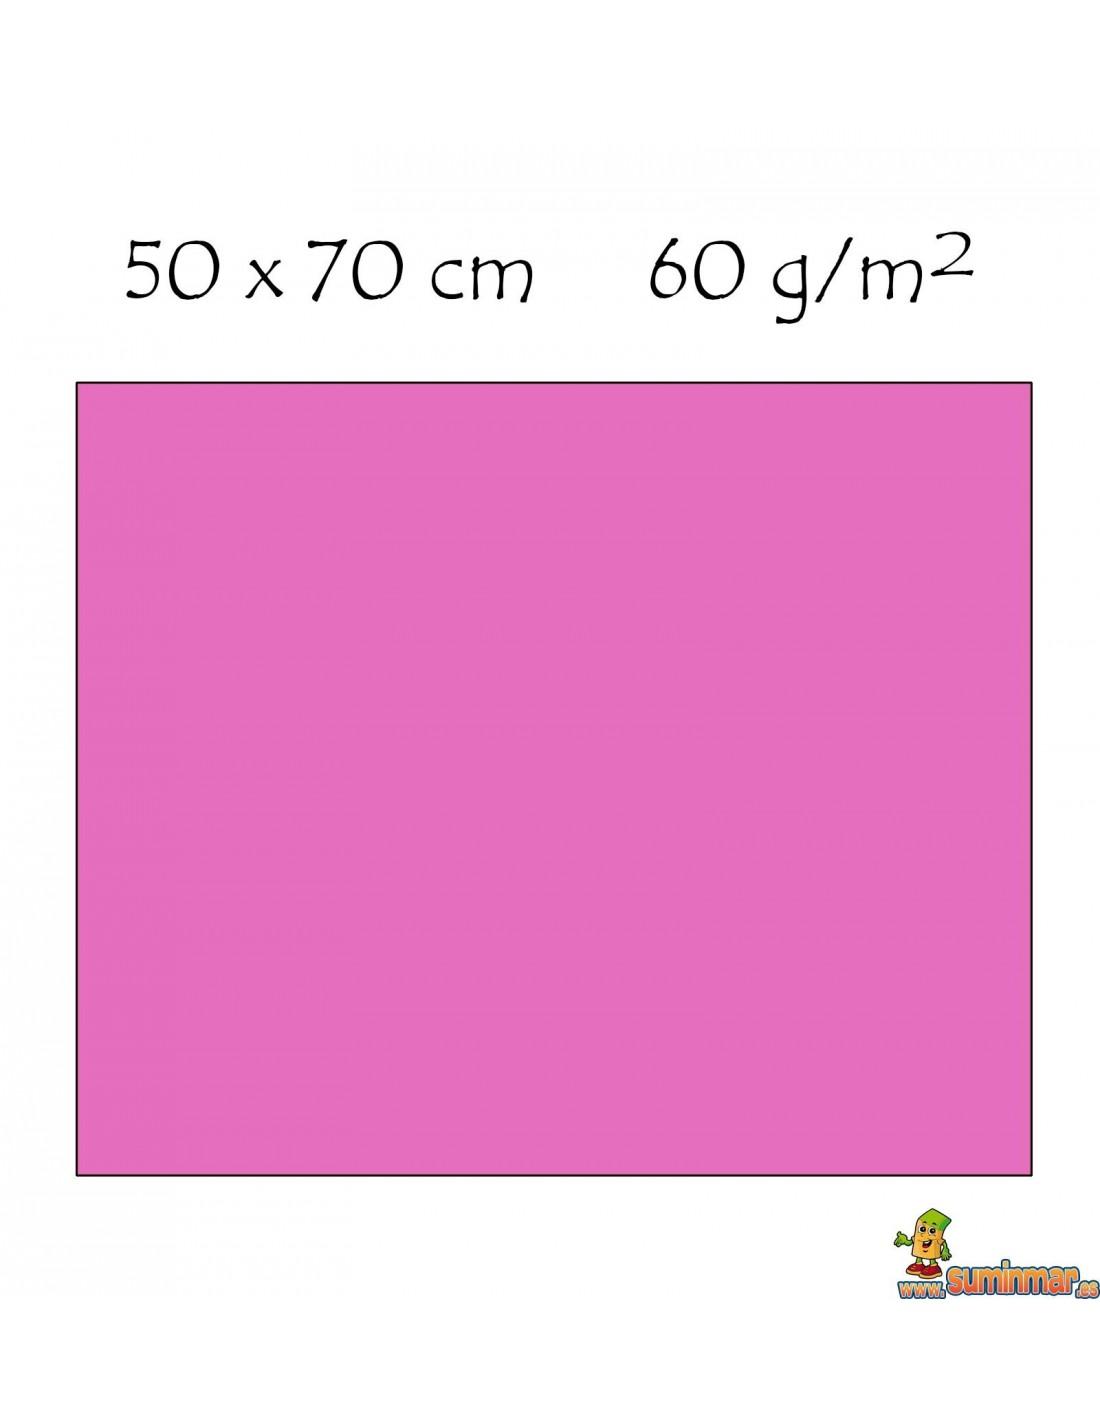 planchas de goma eva textura toalla 50x70cm suminmar tu papeler a. Black Bedroom Furniture Sets. Home Design Ideas